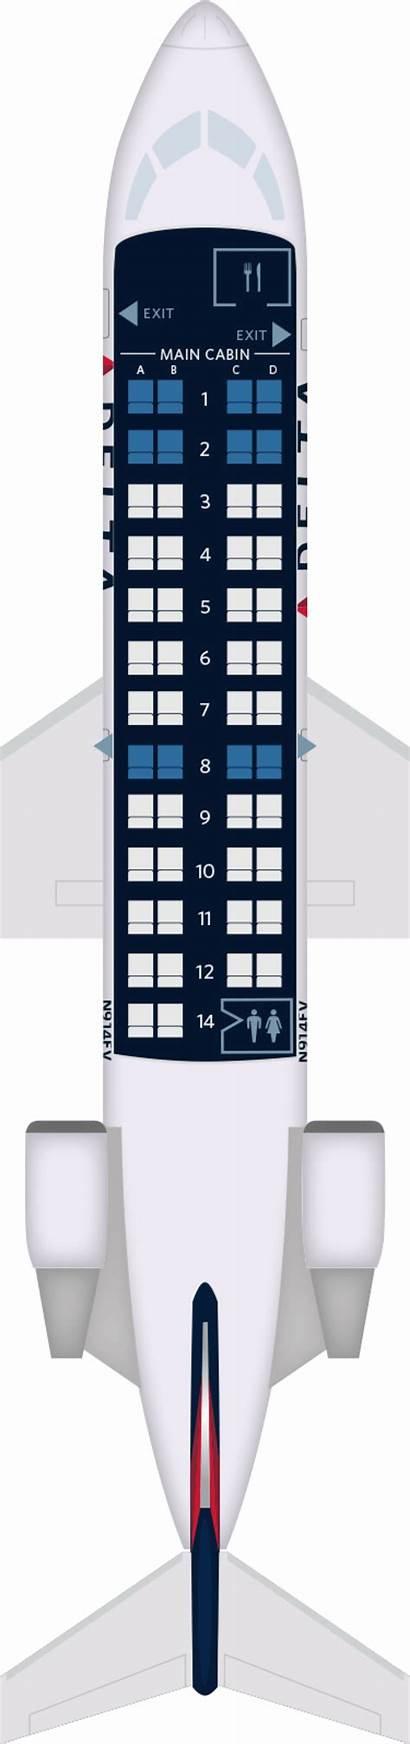 Crj 200 Bombardier Aircraft Delta Seat Map